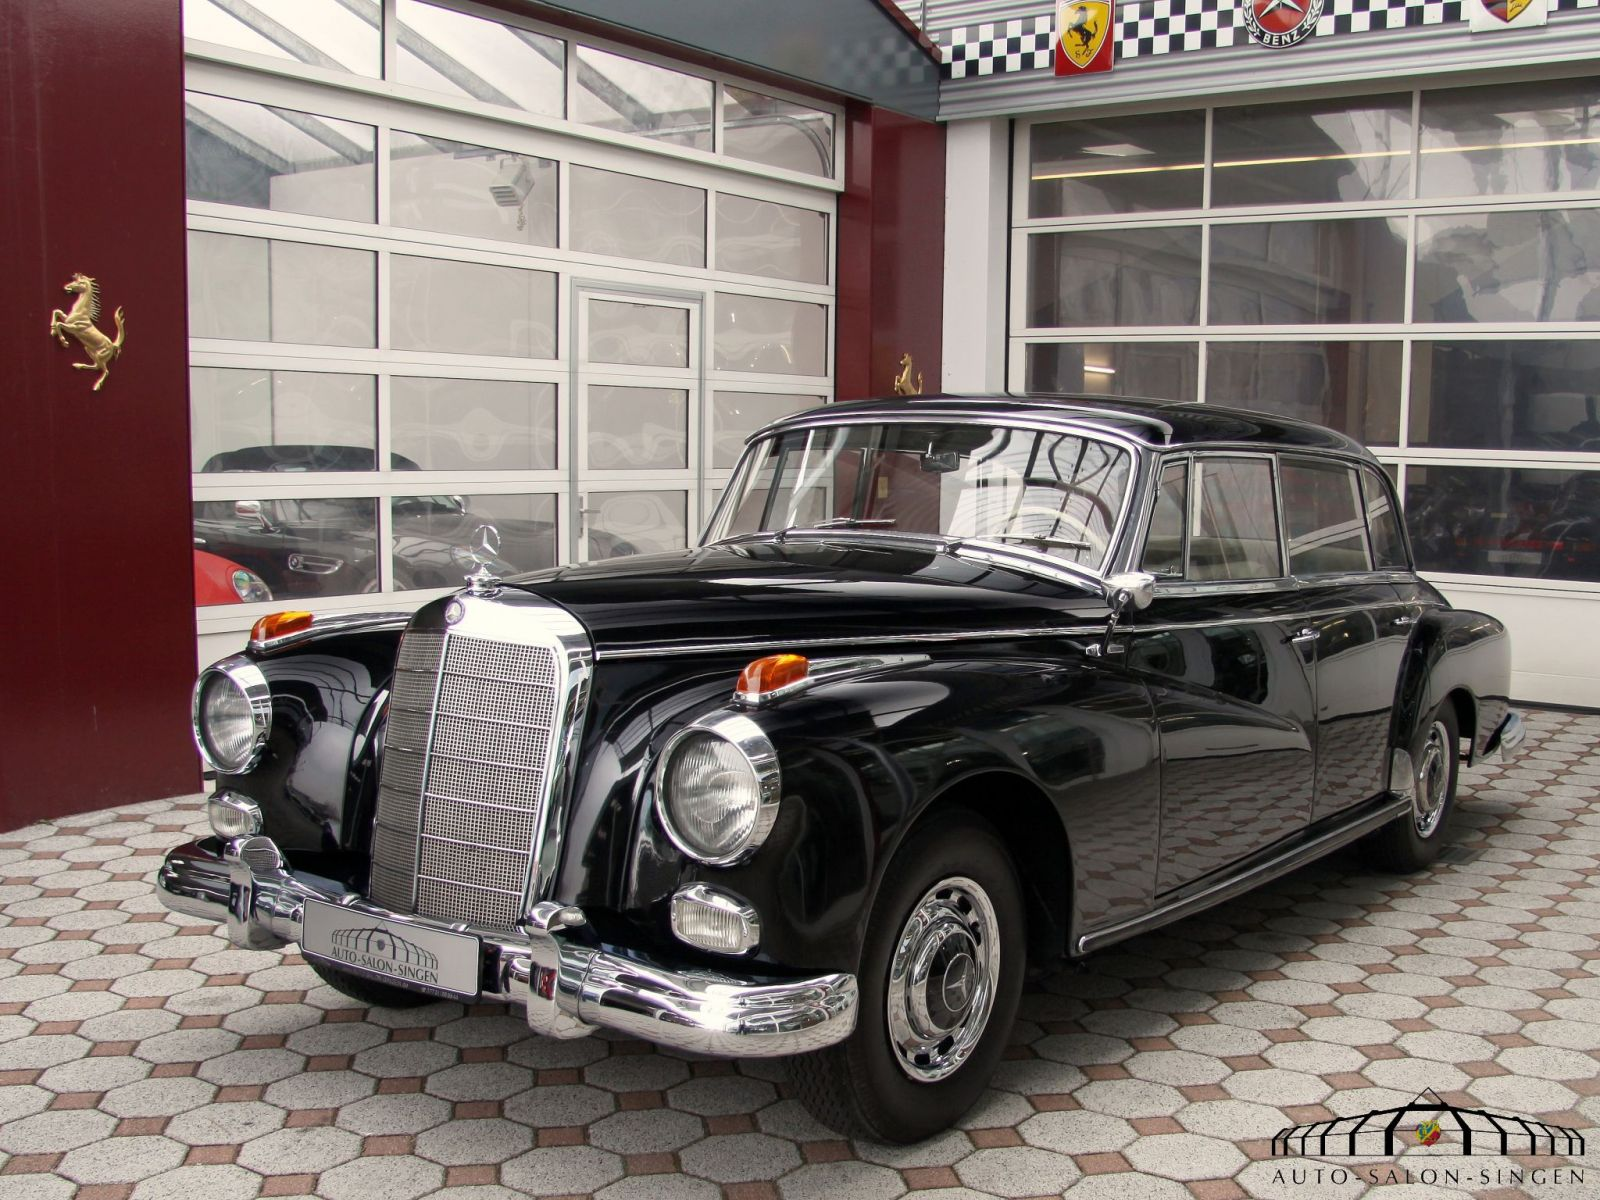 Mercedes benz 300 adenauer limousine auto salon singen for Auto mercedes benz